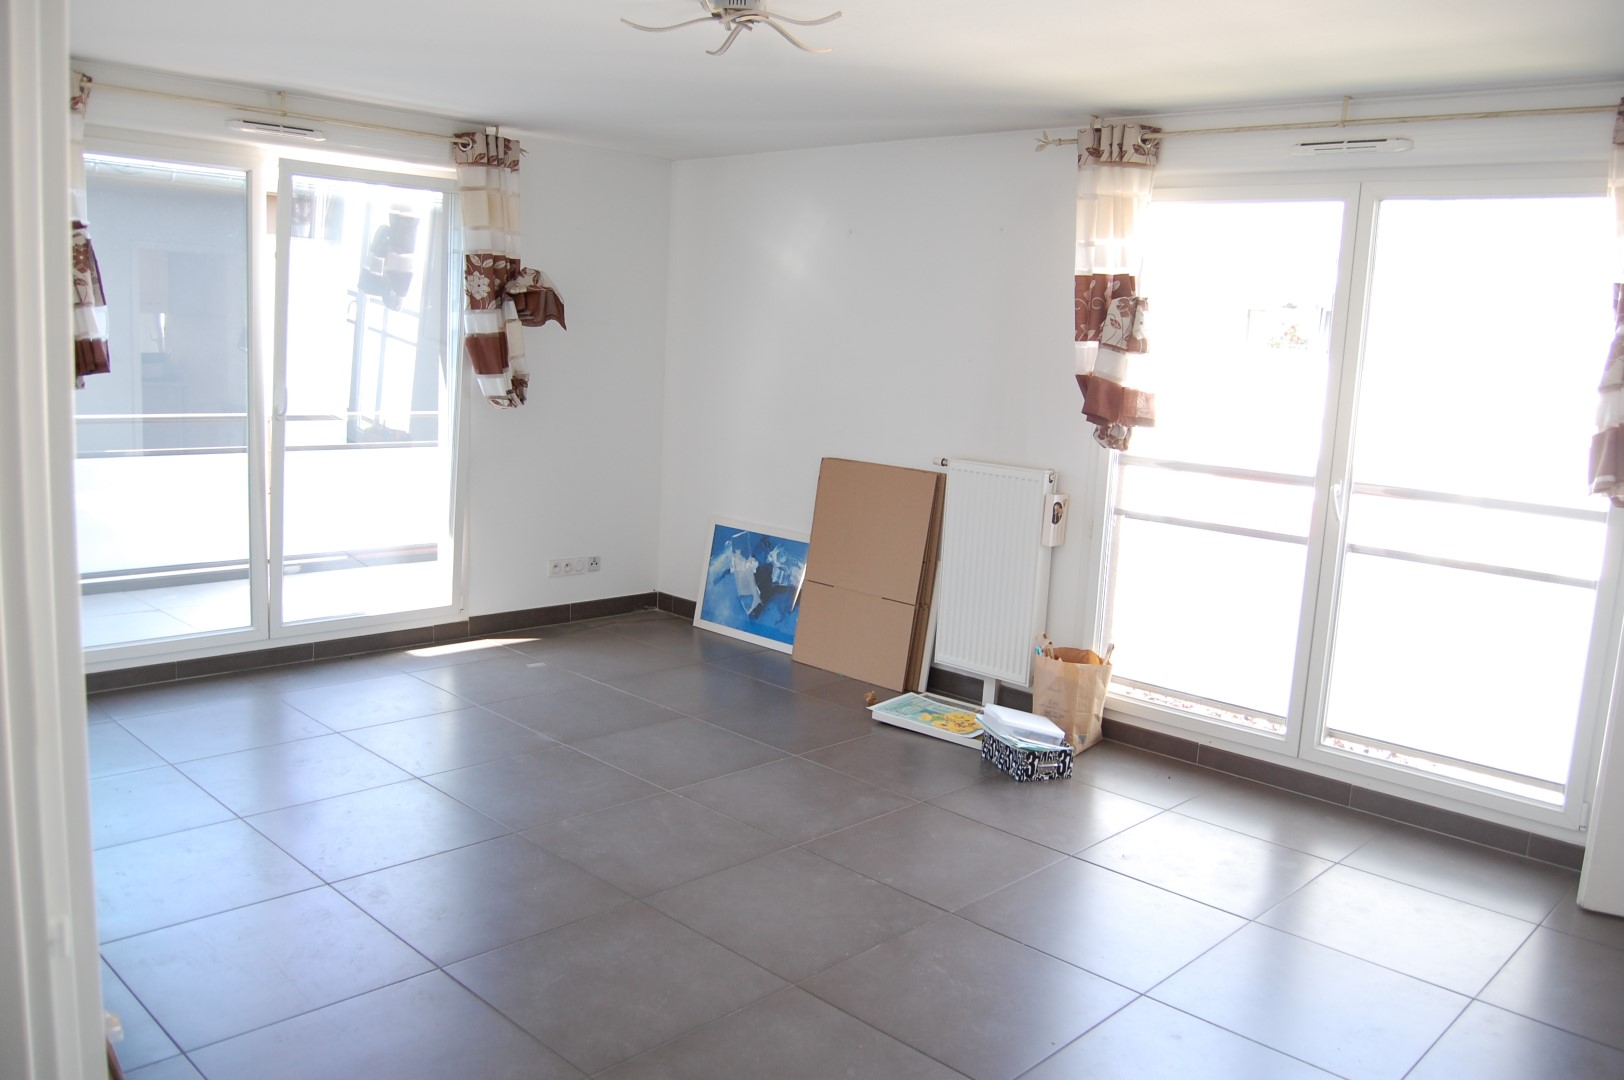 COLMAR En exclu Beau F4 de 89 m² Proche centre